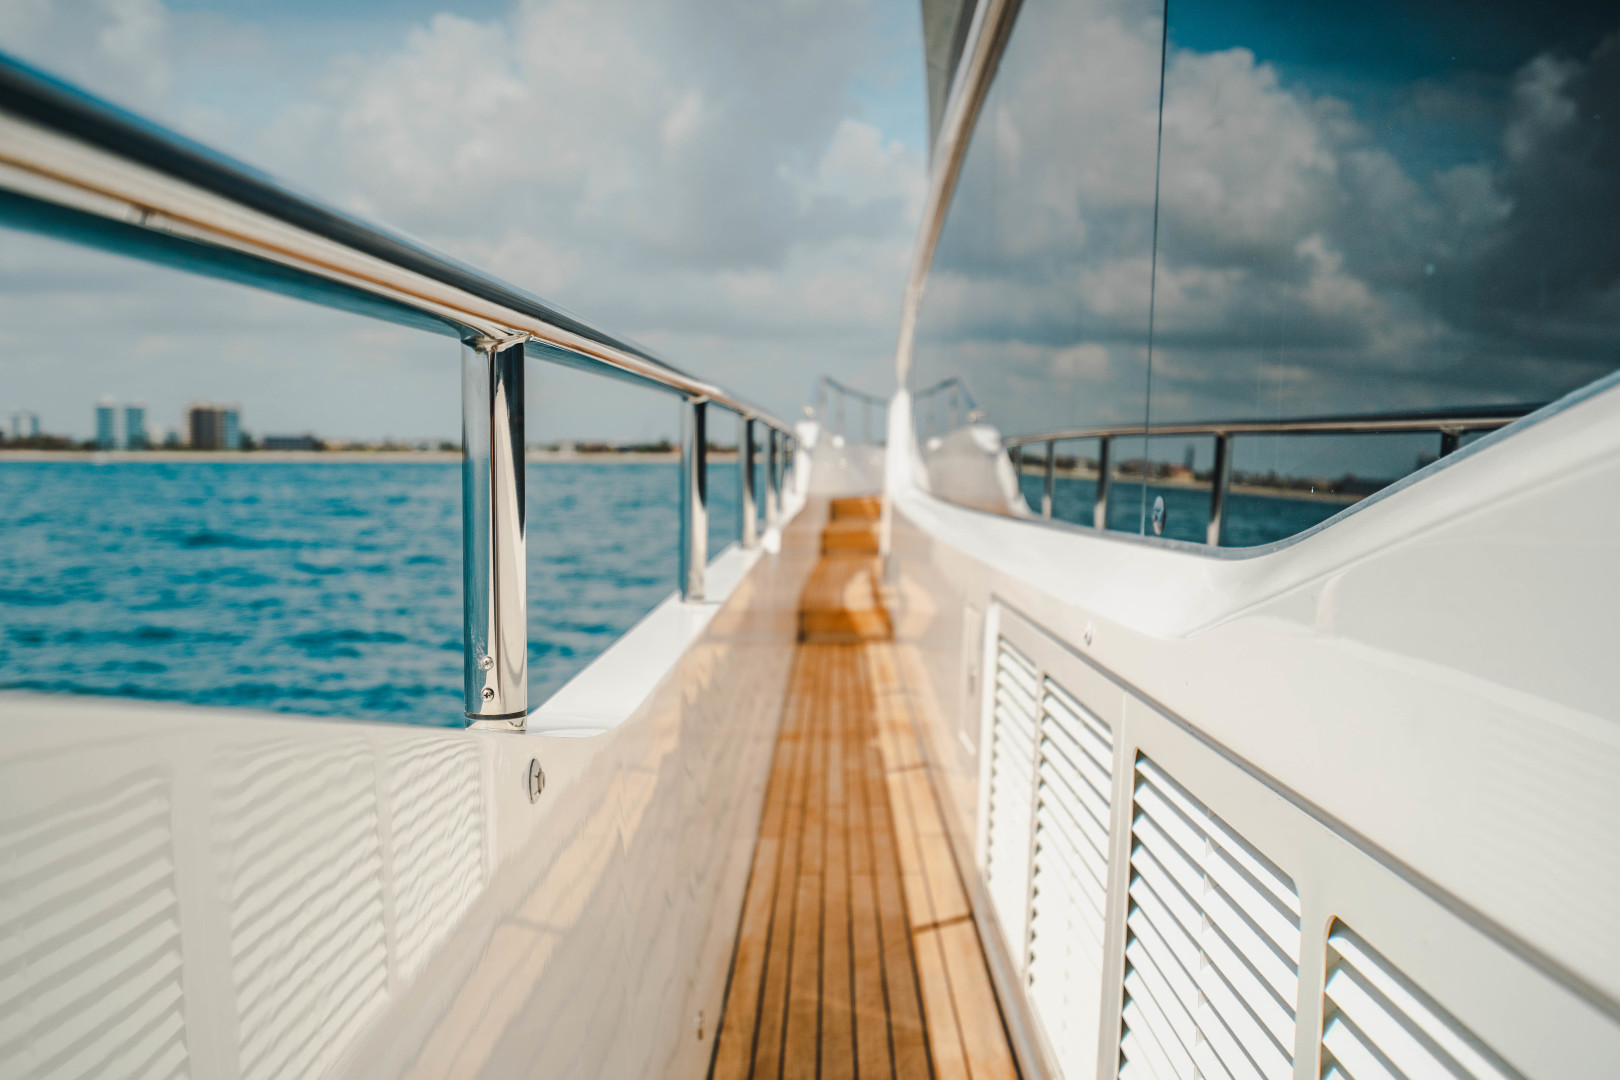 Princess-Y85  2019-Splash Delray Beach-Florida-United States-1631617 | Thumbnail